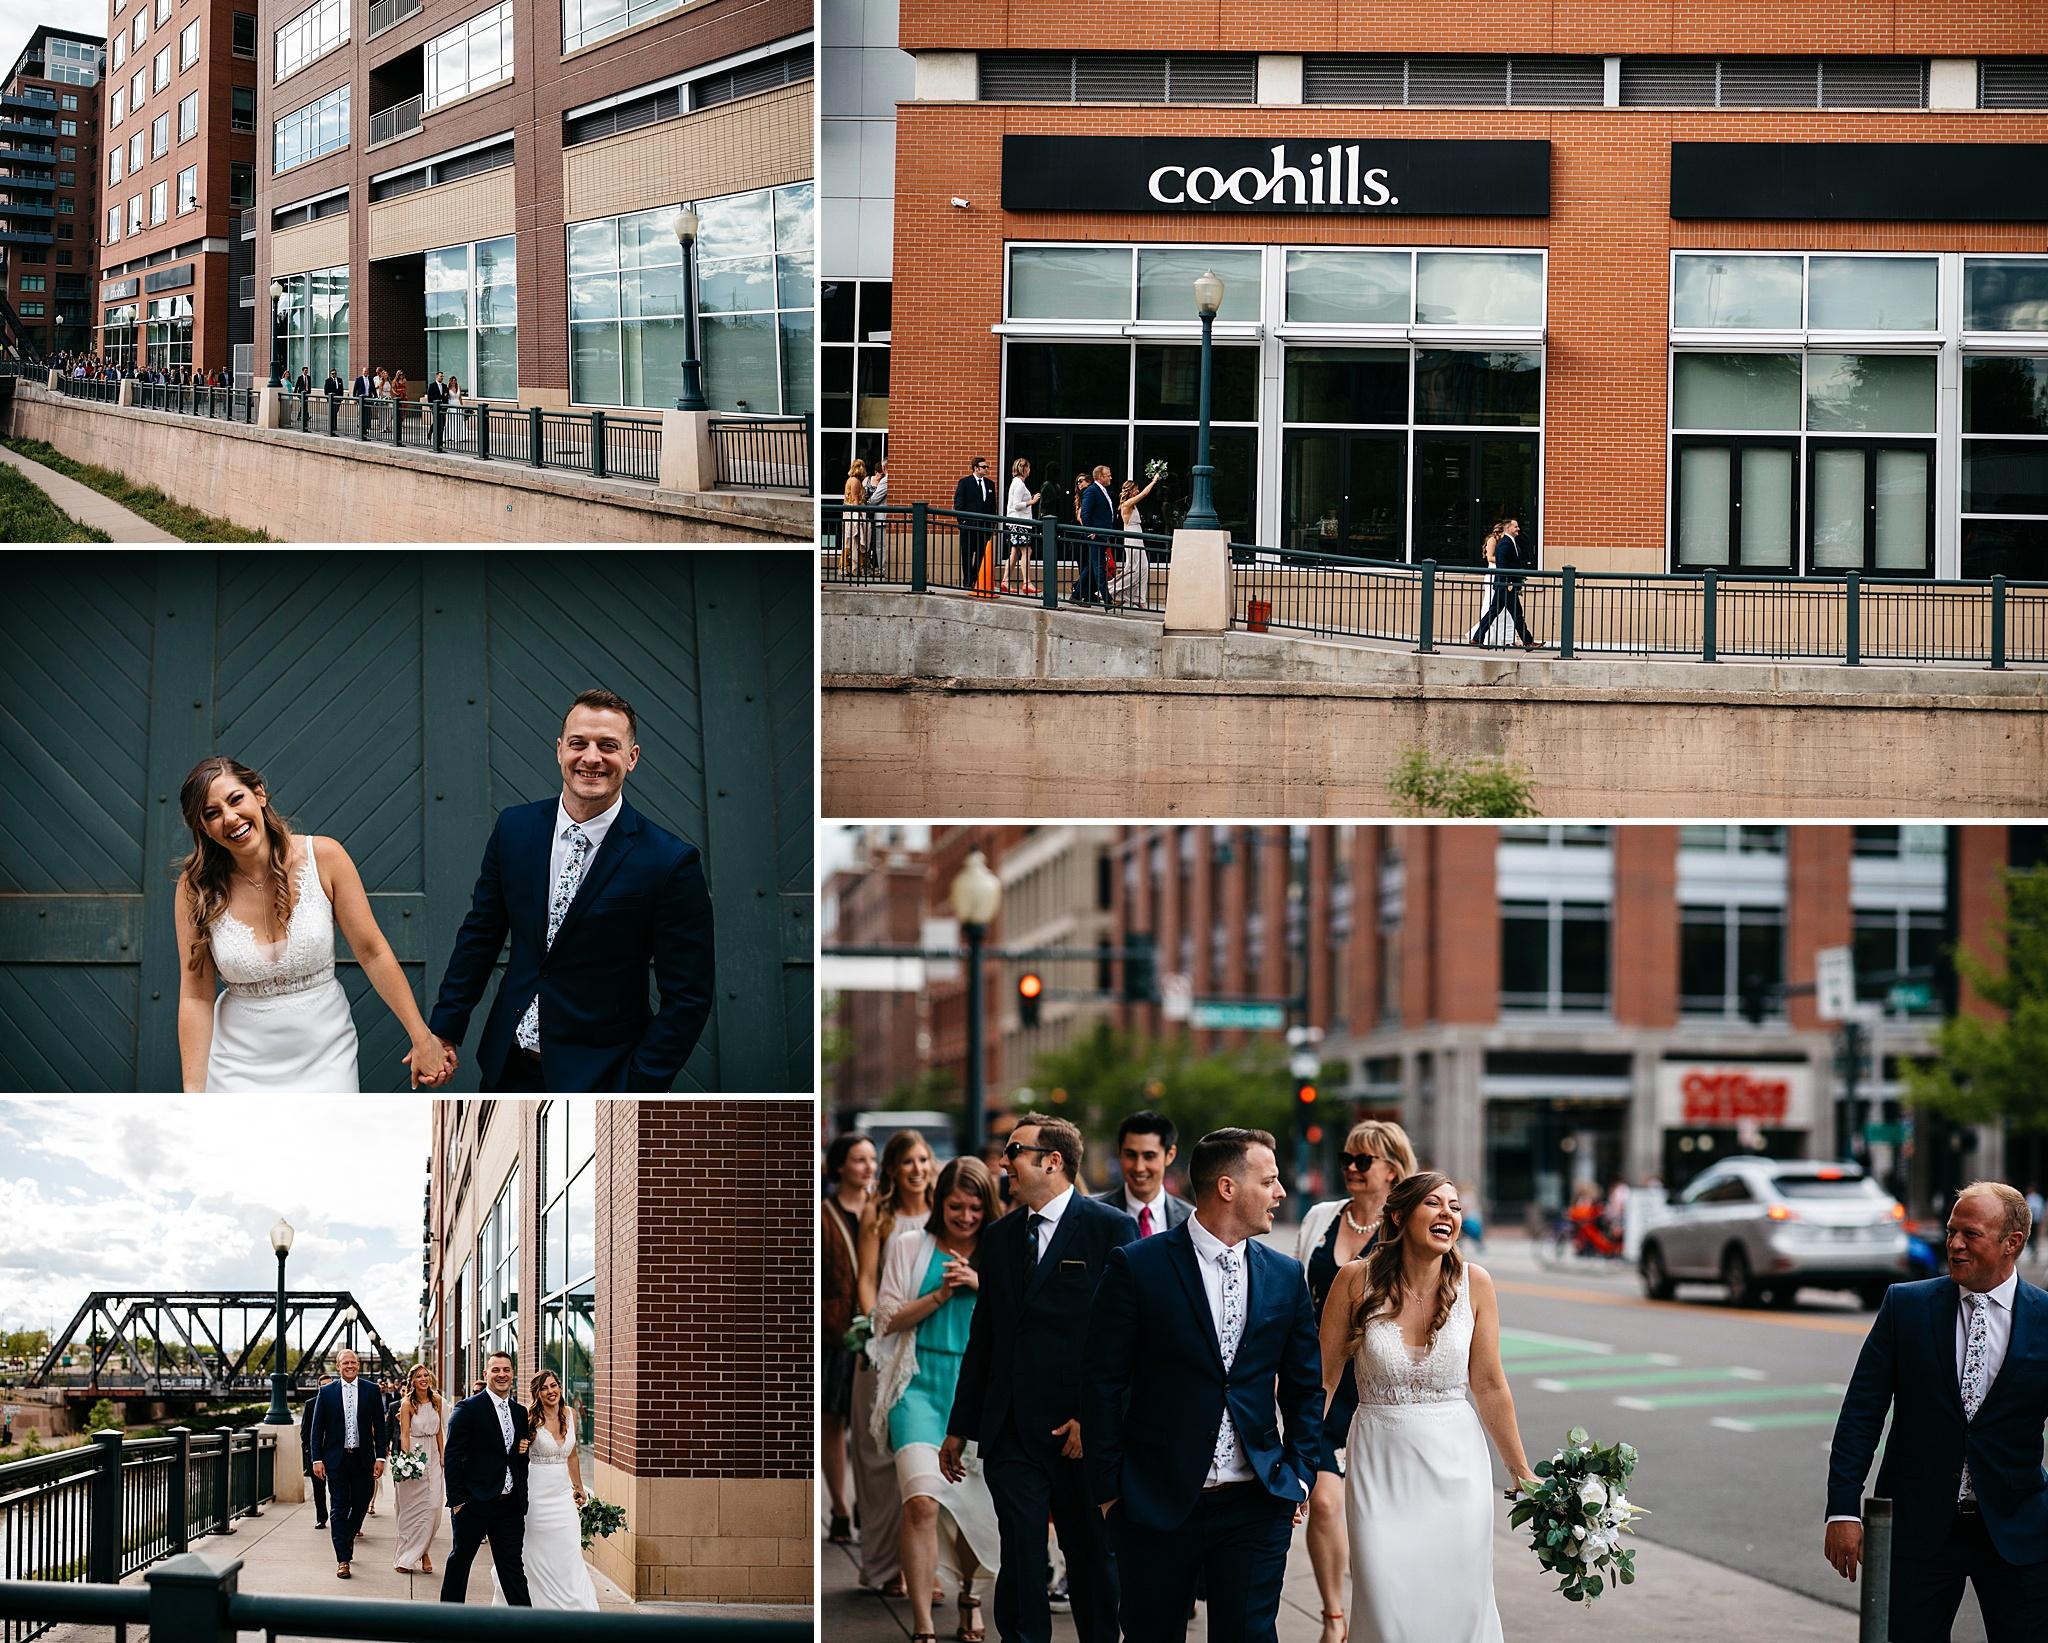 K+C-Denver-Coohills-Wynkoop-Wedding-Photography-61_WEB.jpg